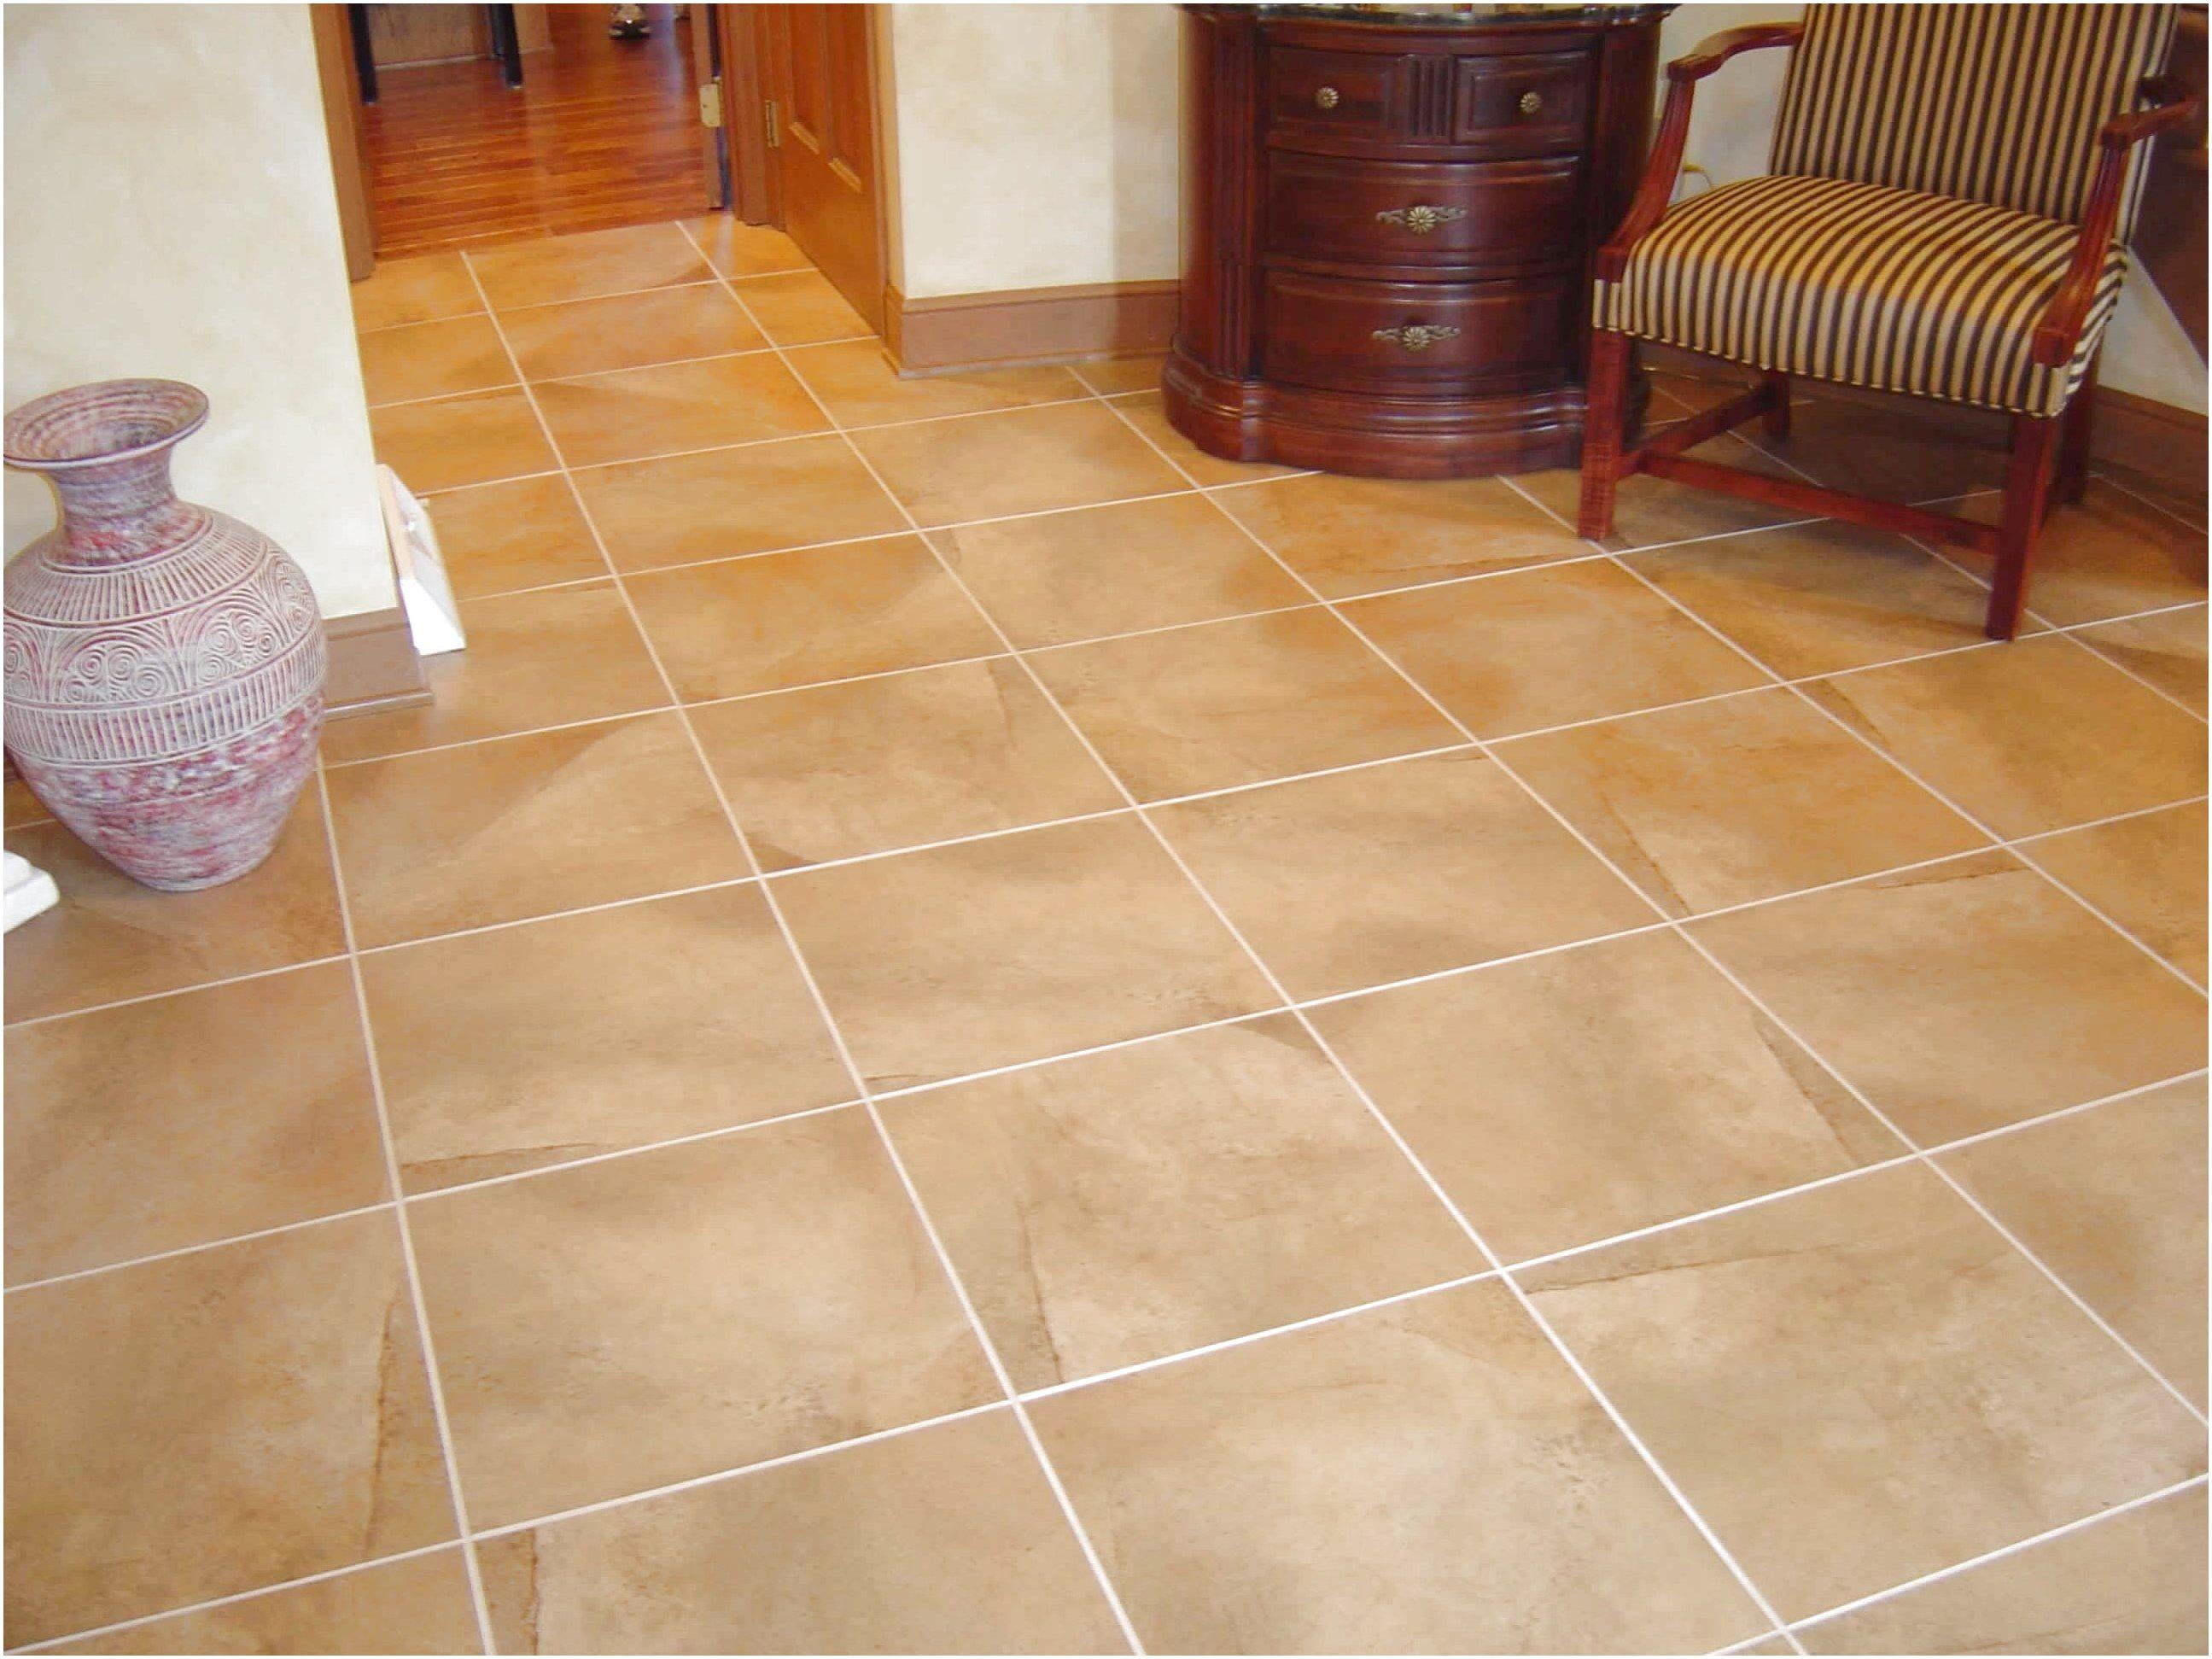 Different Designs For Your Floor Using Ceramics Carpet Cleaning Hacks Ceramic Floor Tiles Carpet Cleaning Pet Stains